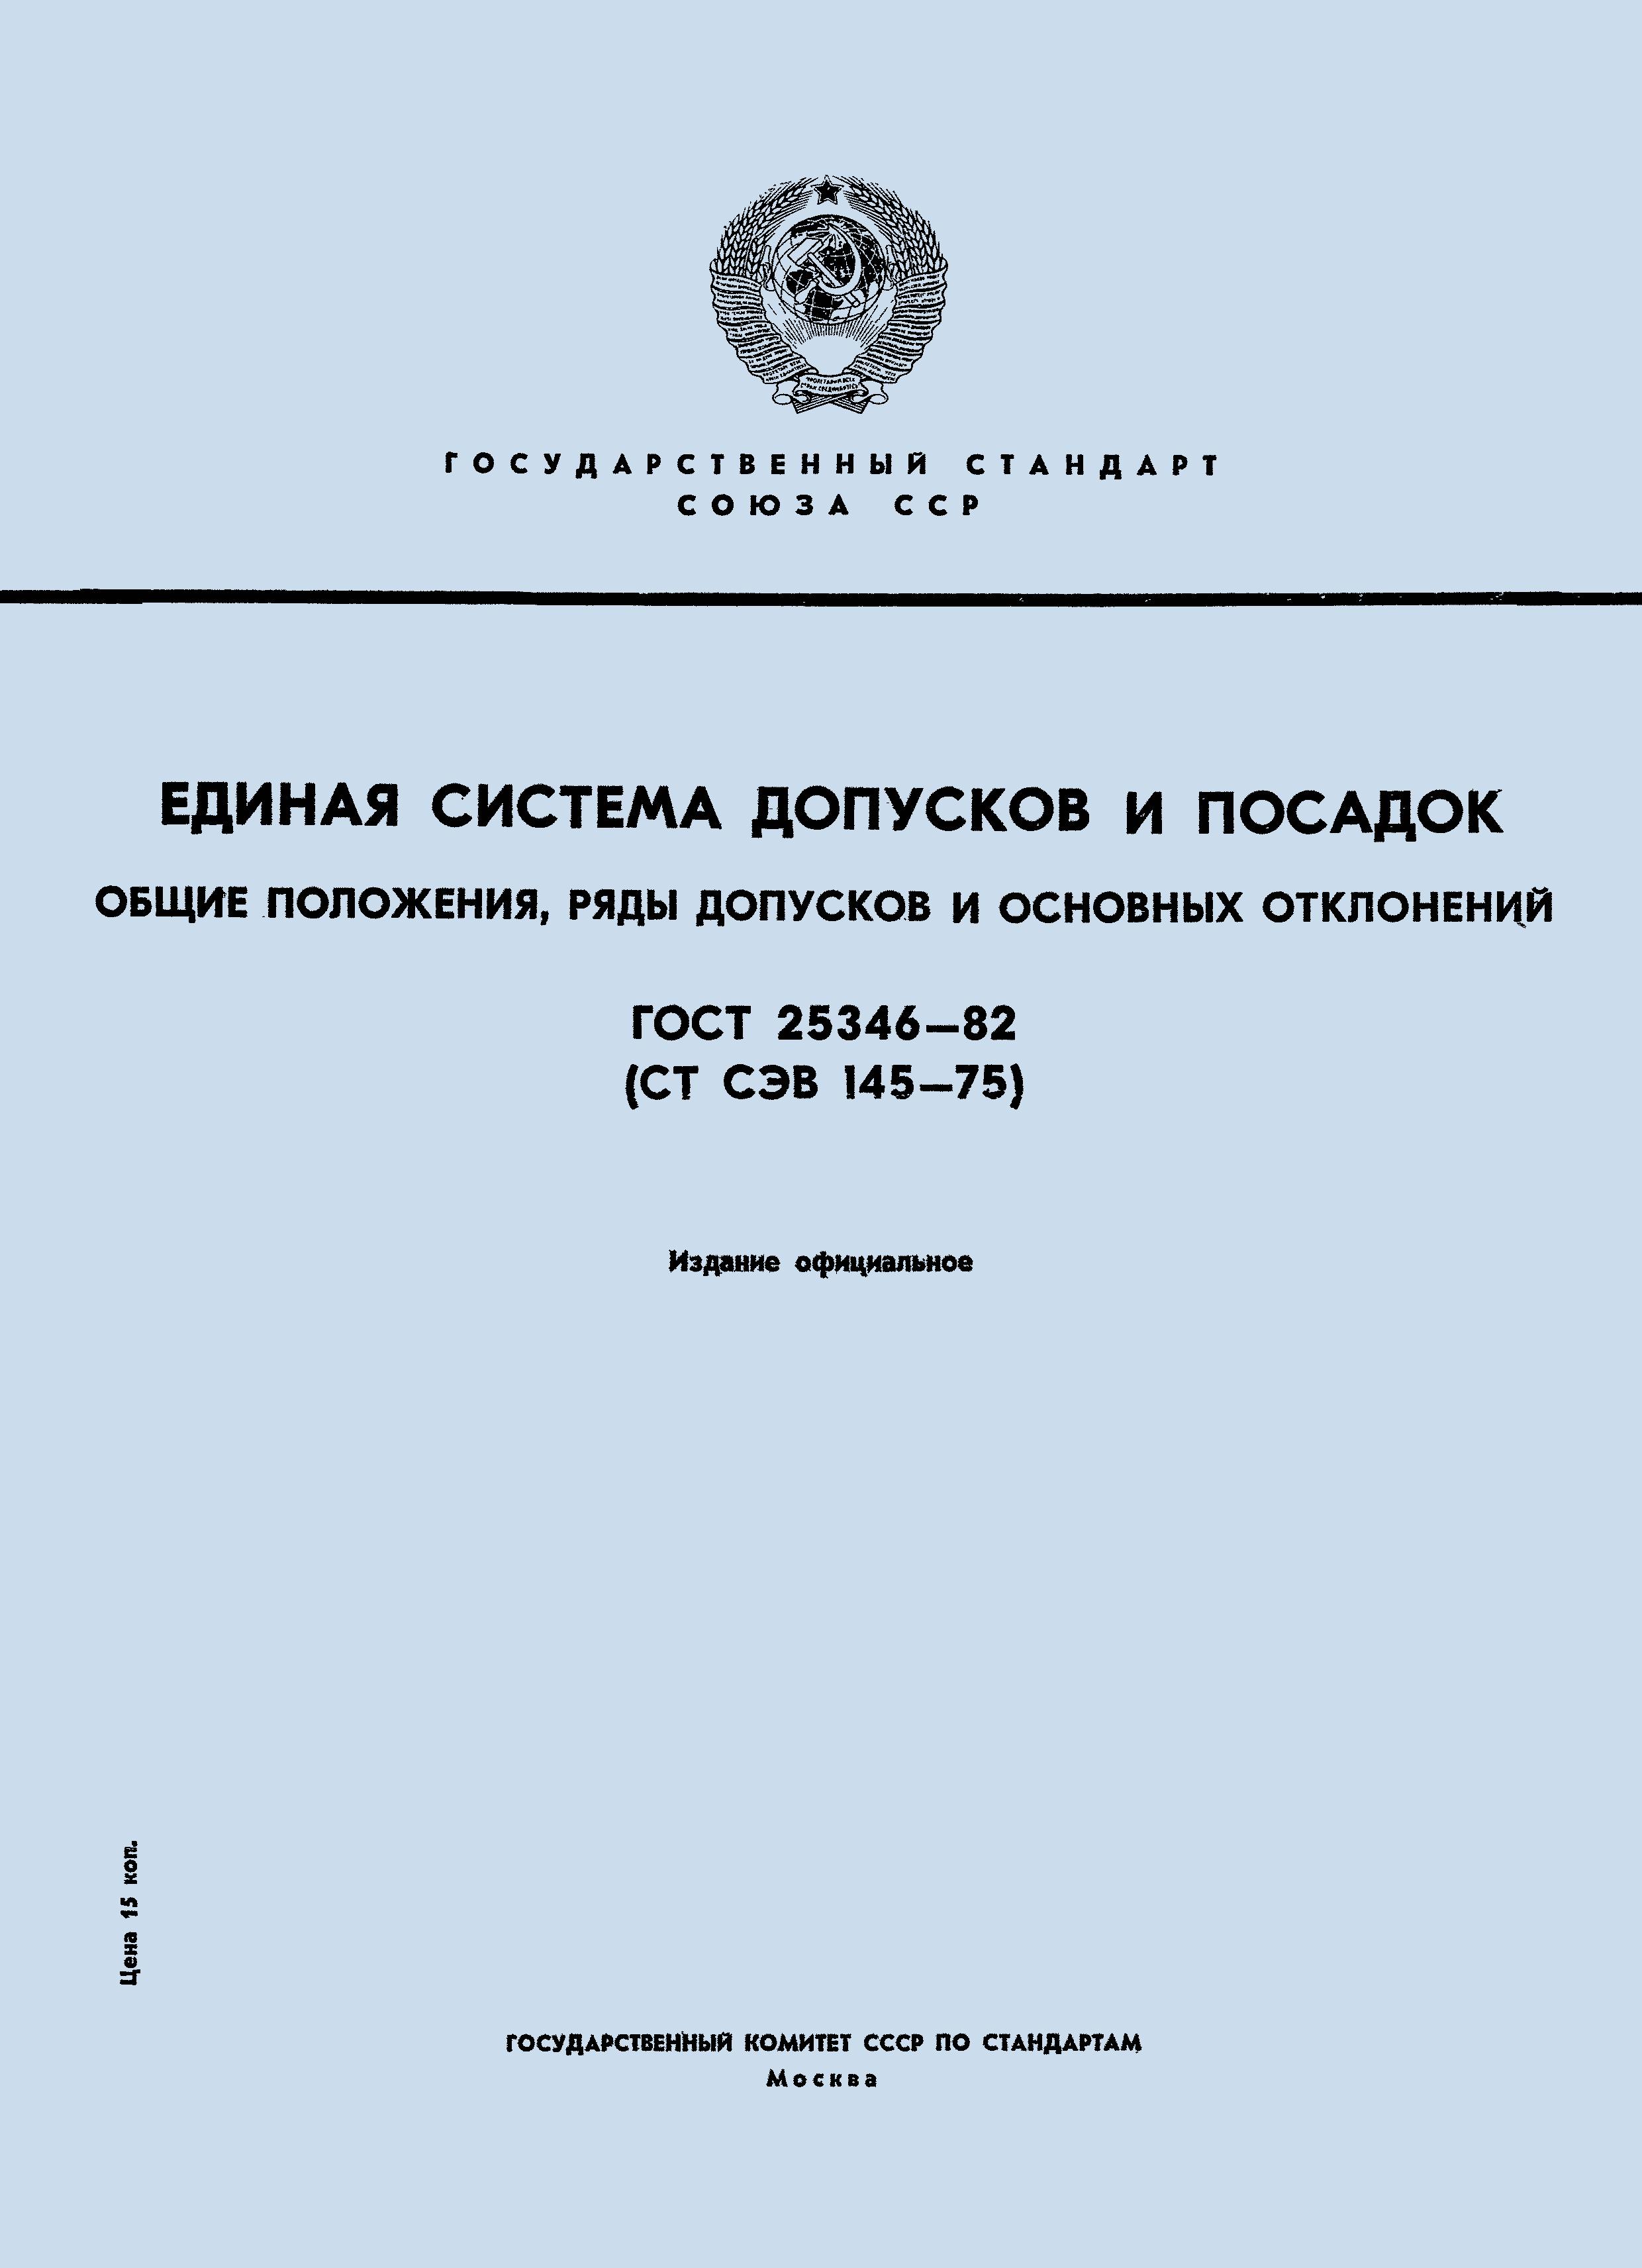 гост 25348-2013